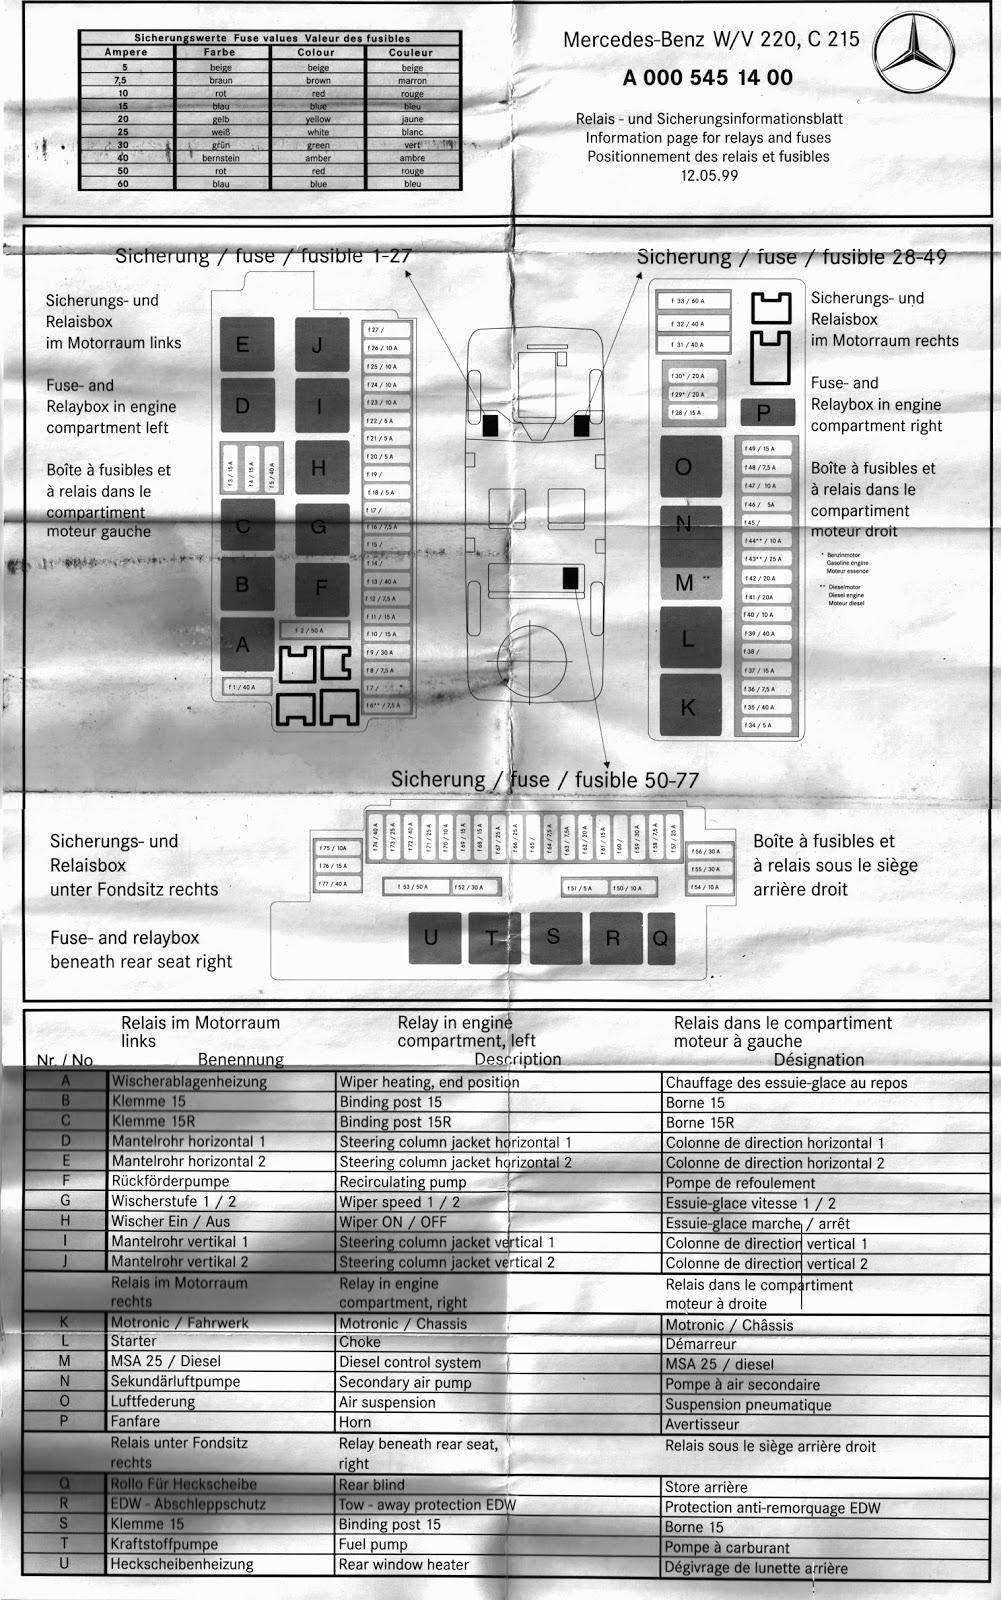 mercedes benz s430 fuse box diagram repair machine Mercedes-Benz C240 Fuse Chart